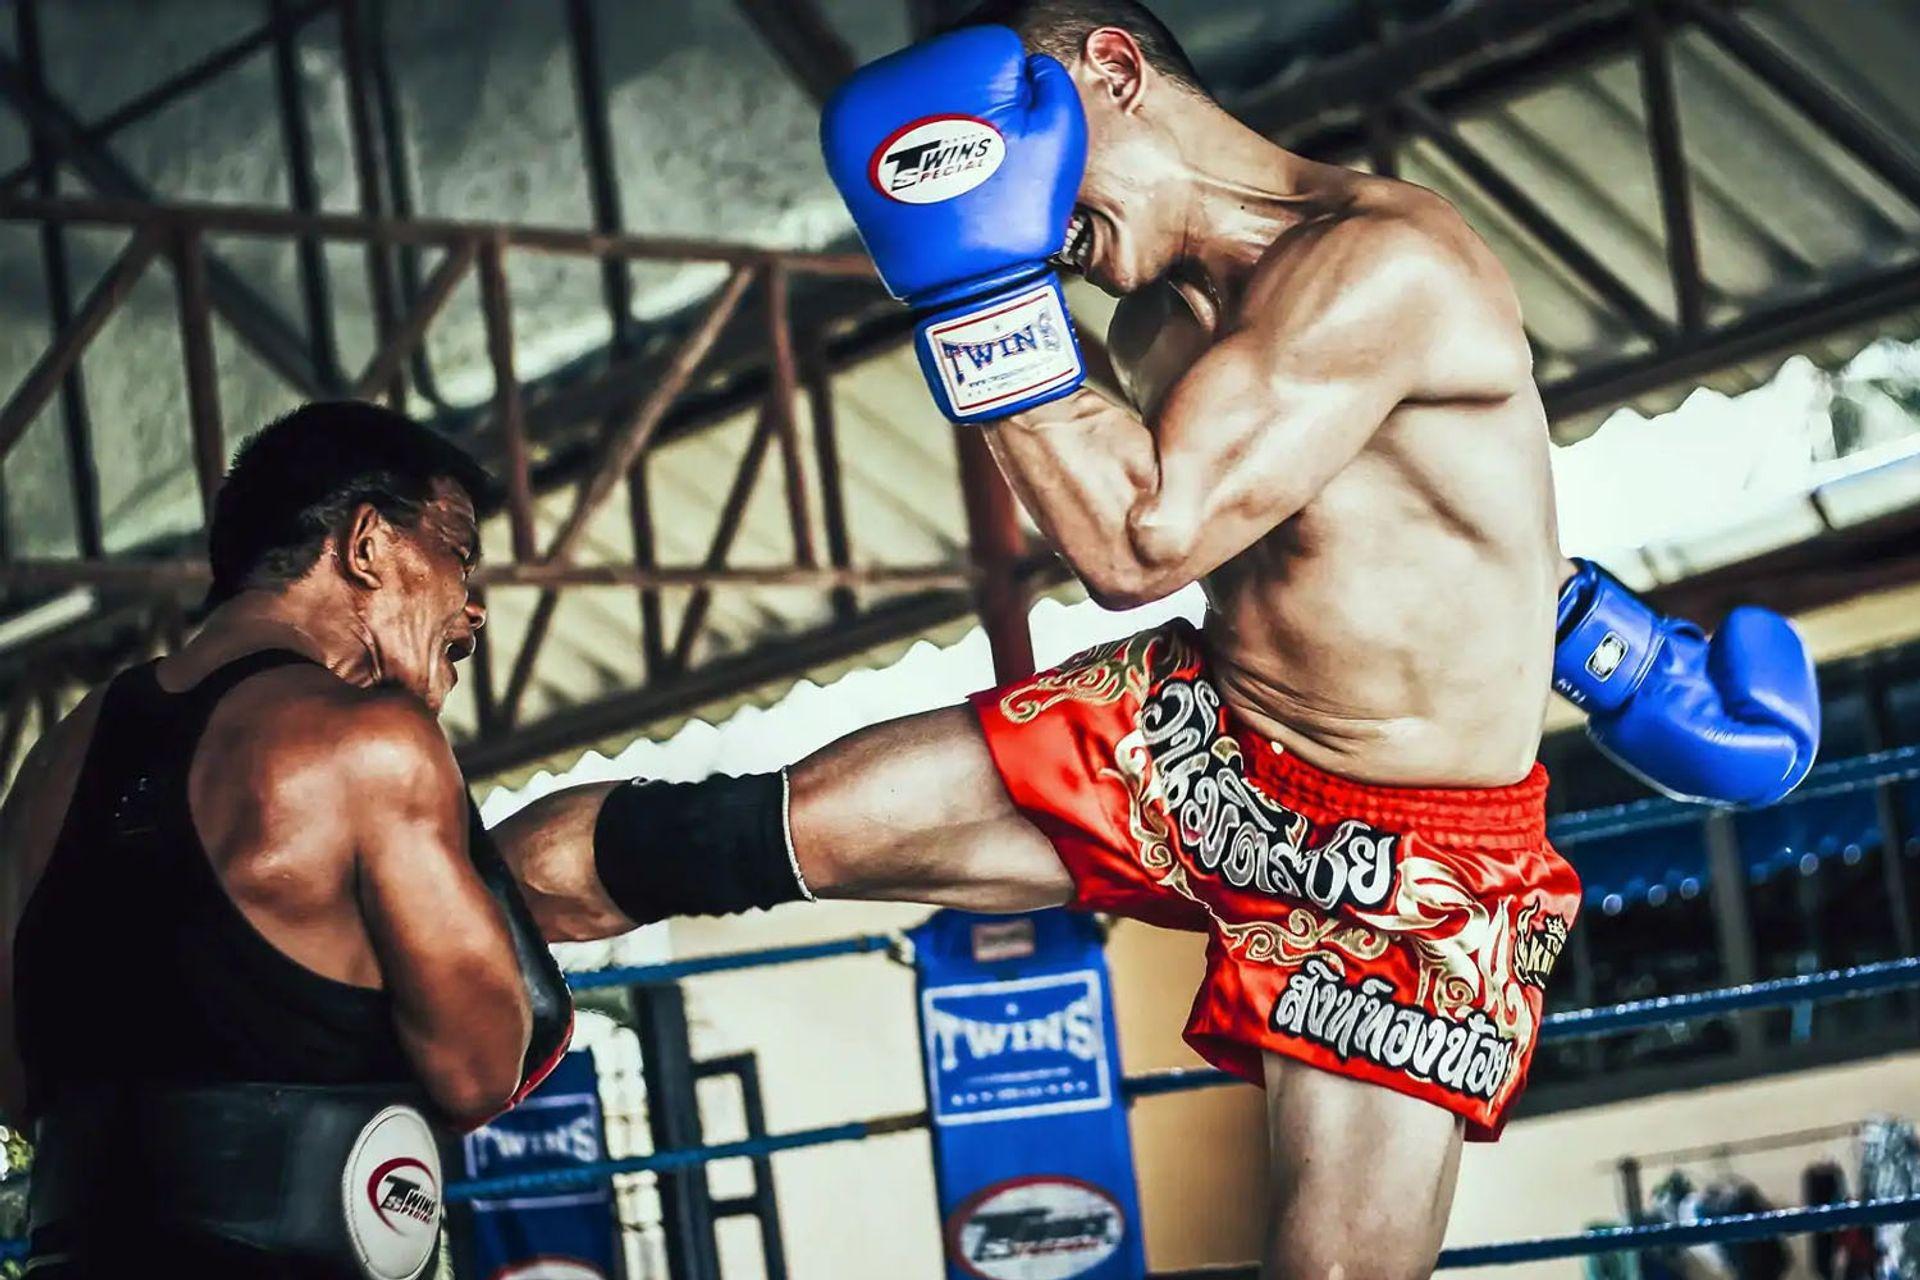 Luktupfah Muay Thai School